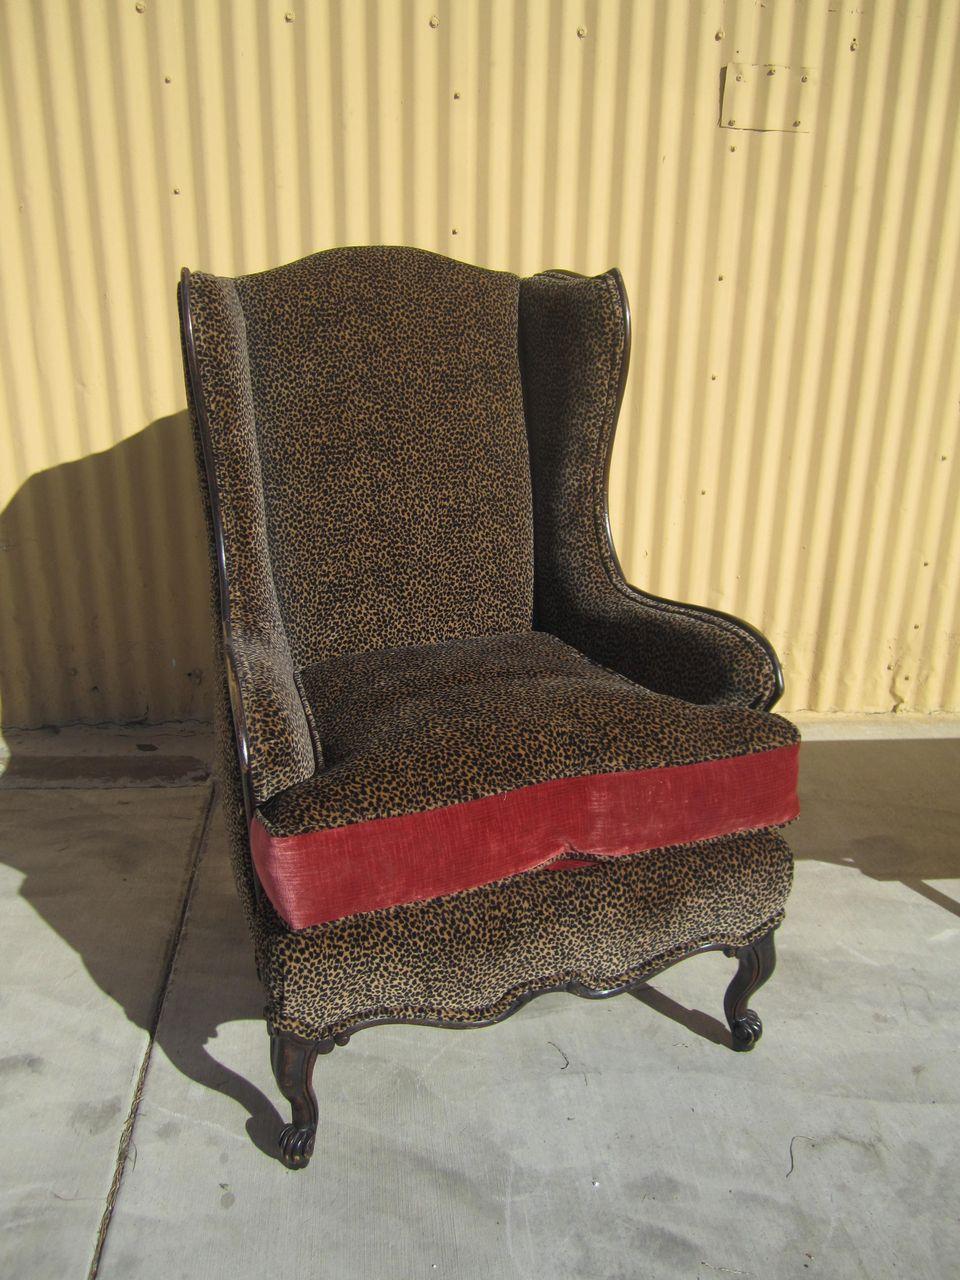 Vintage Wing Leopard Arm Chair Sitting Pretty